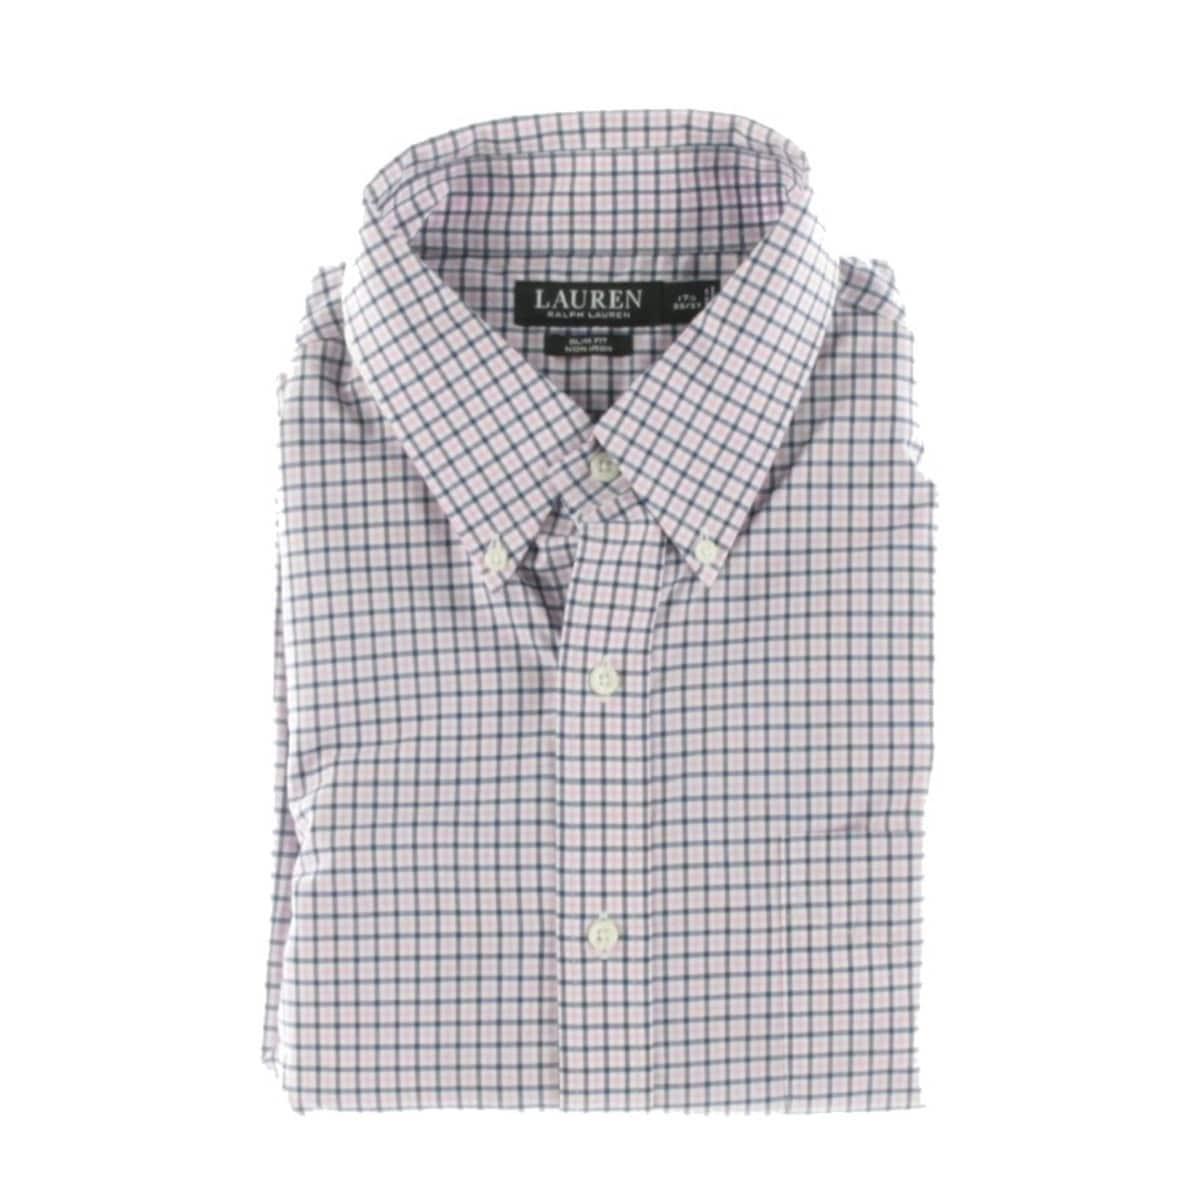 Lauren Ralph Lauren Mens Dress Shirt Non Iron Slim Fit